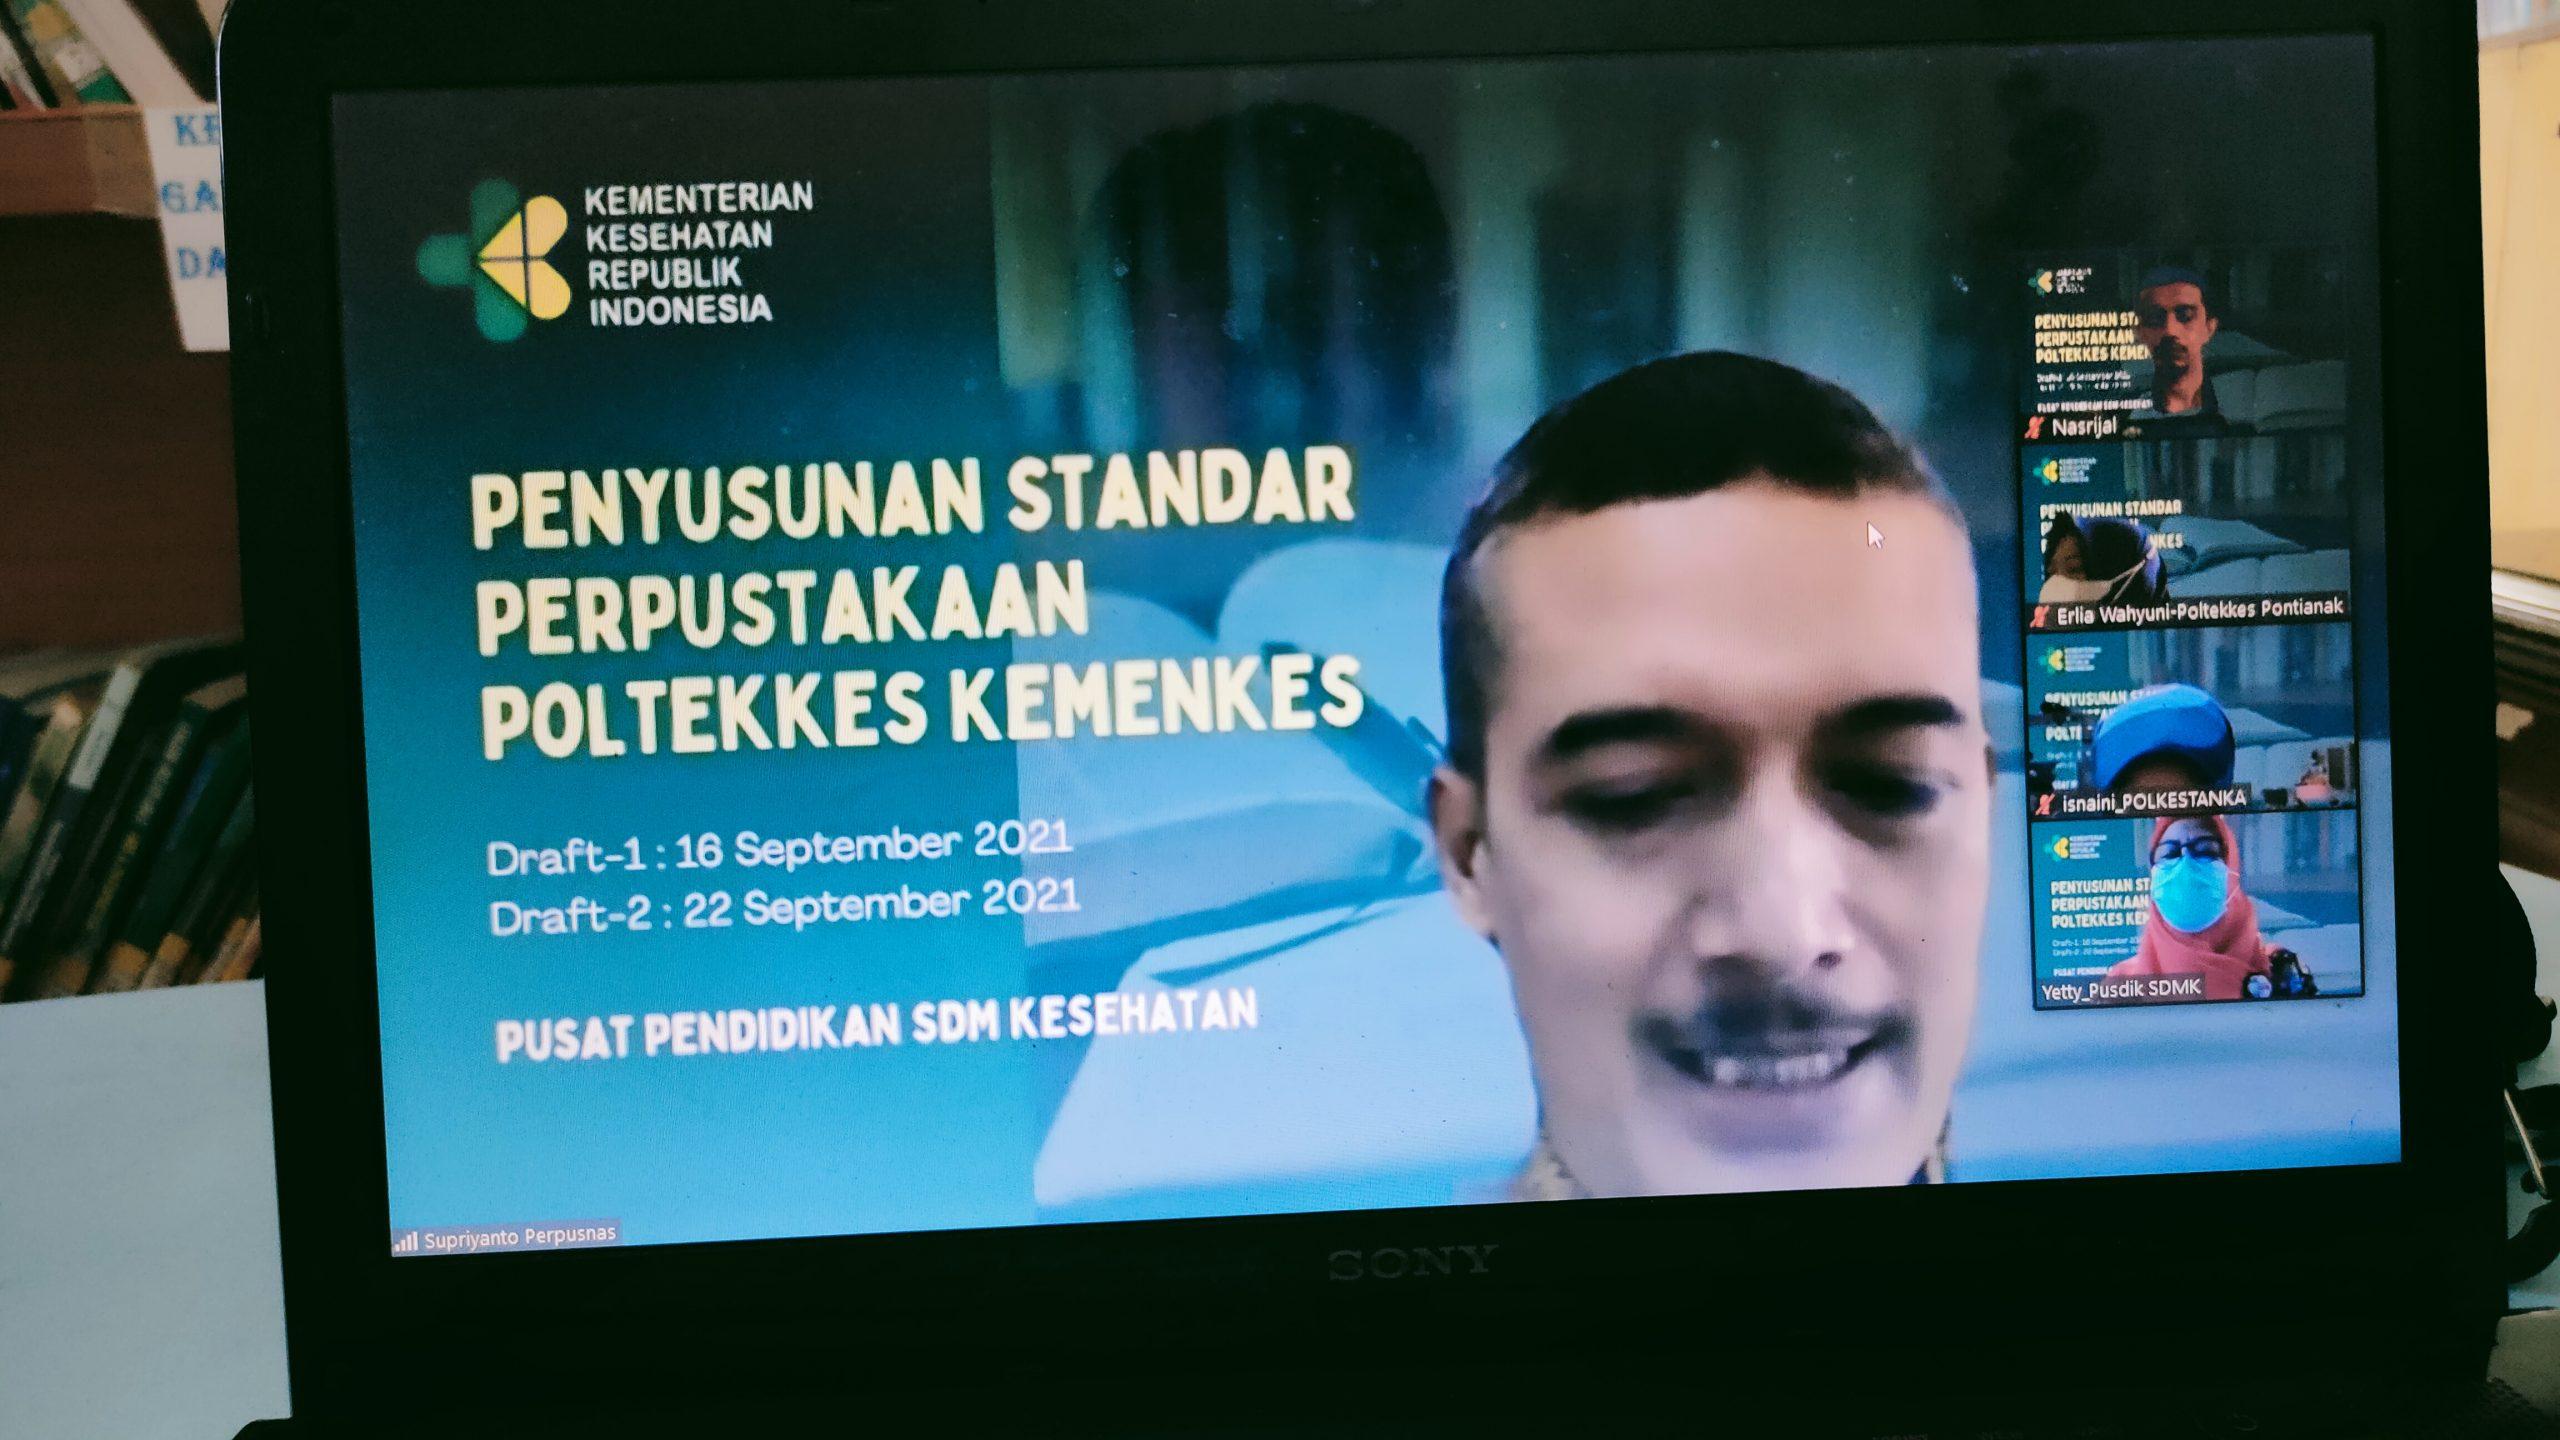 Pustaka Poltekkes Aceh Tergabung dalam Penyusunan Standar Perpustakaan Dilingkungan Kemenkes RI